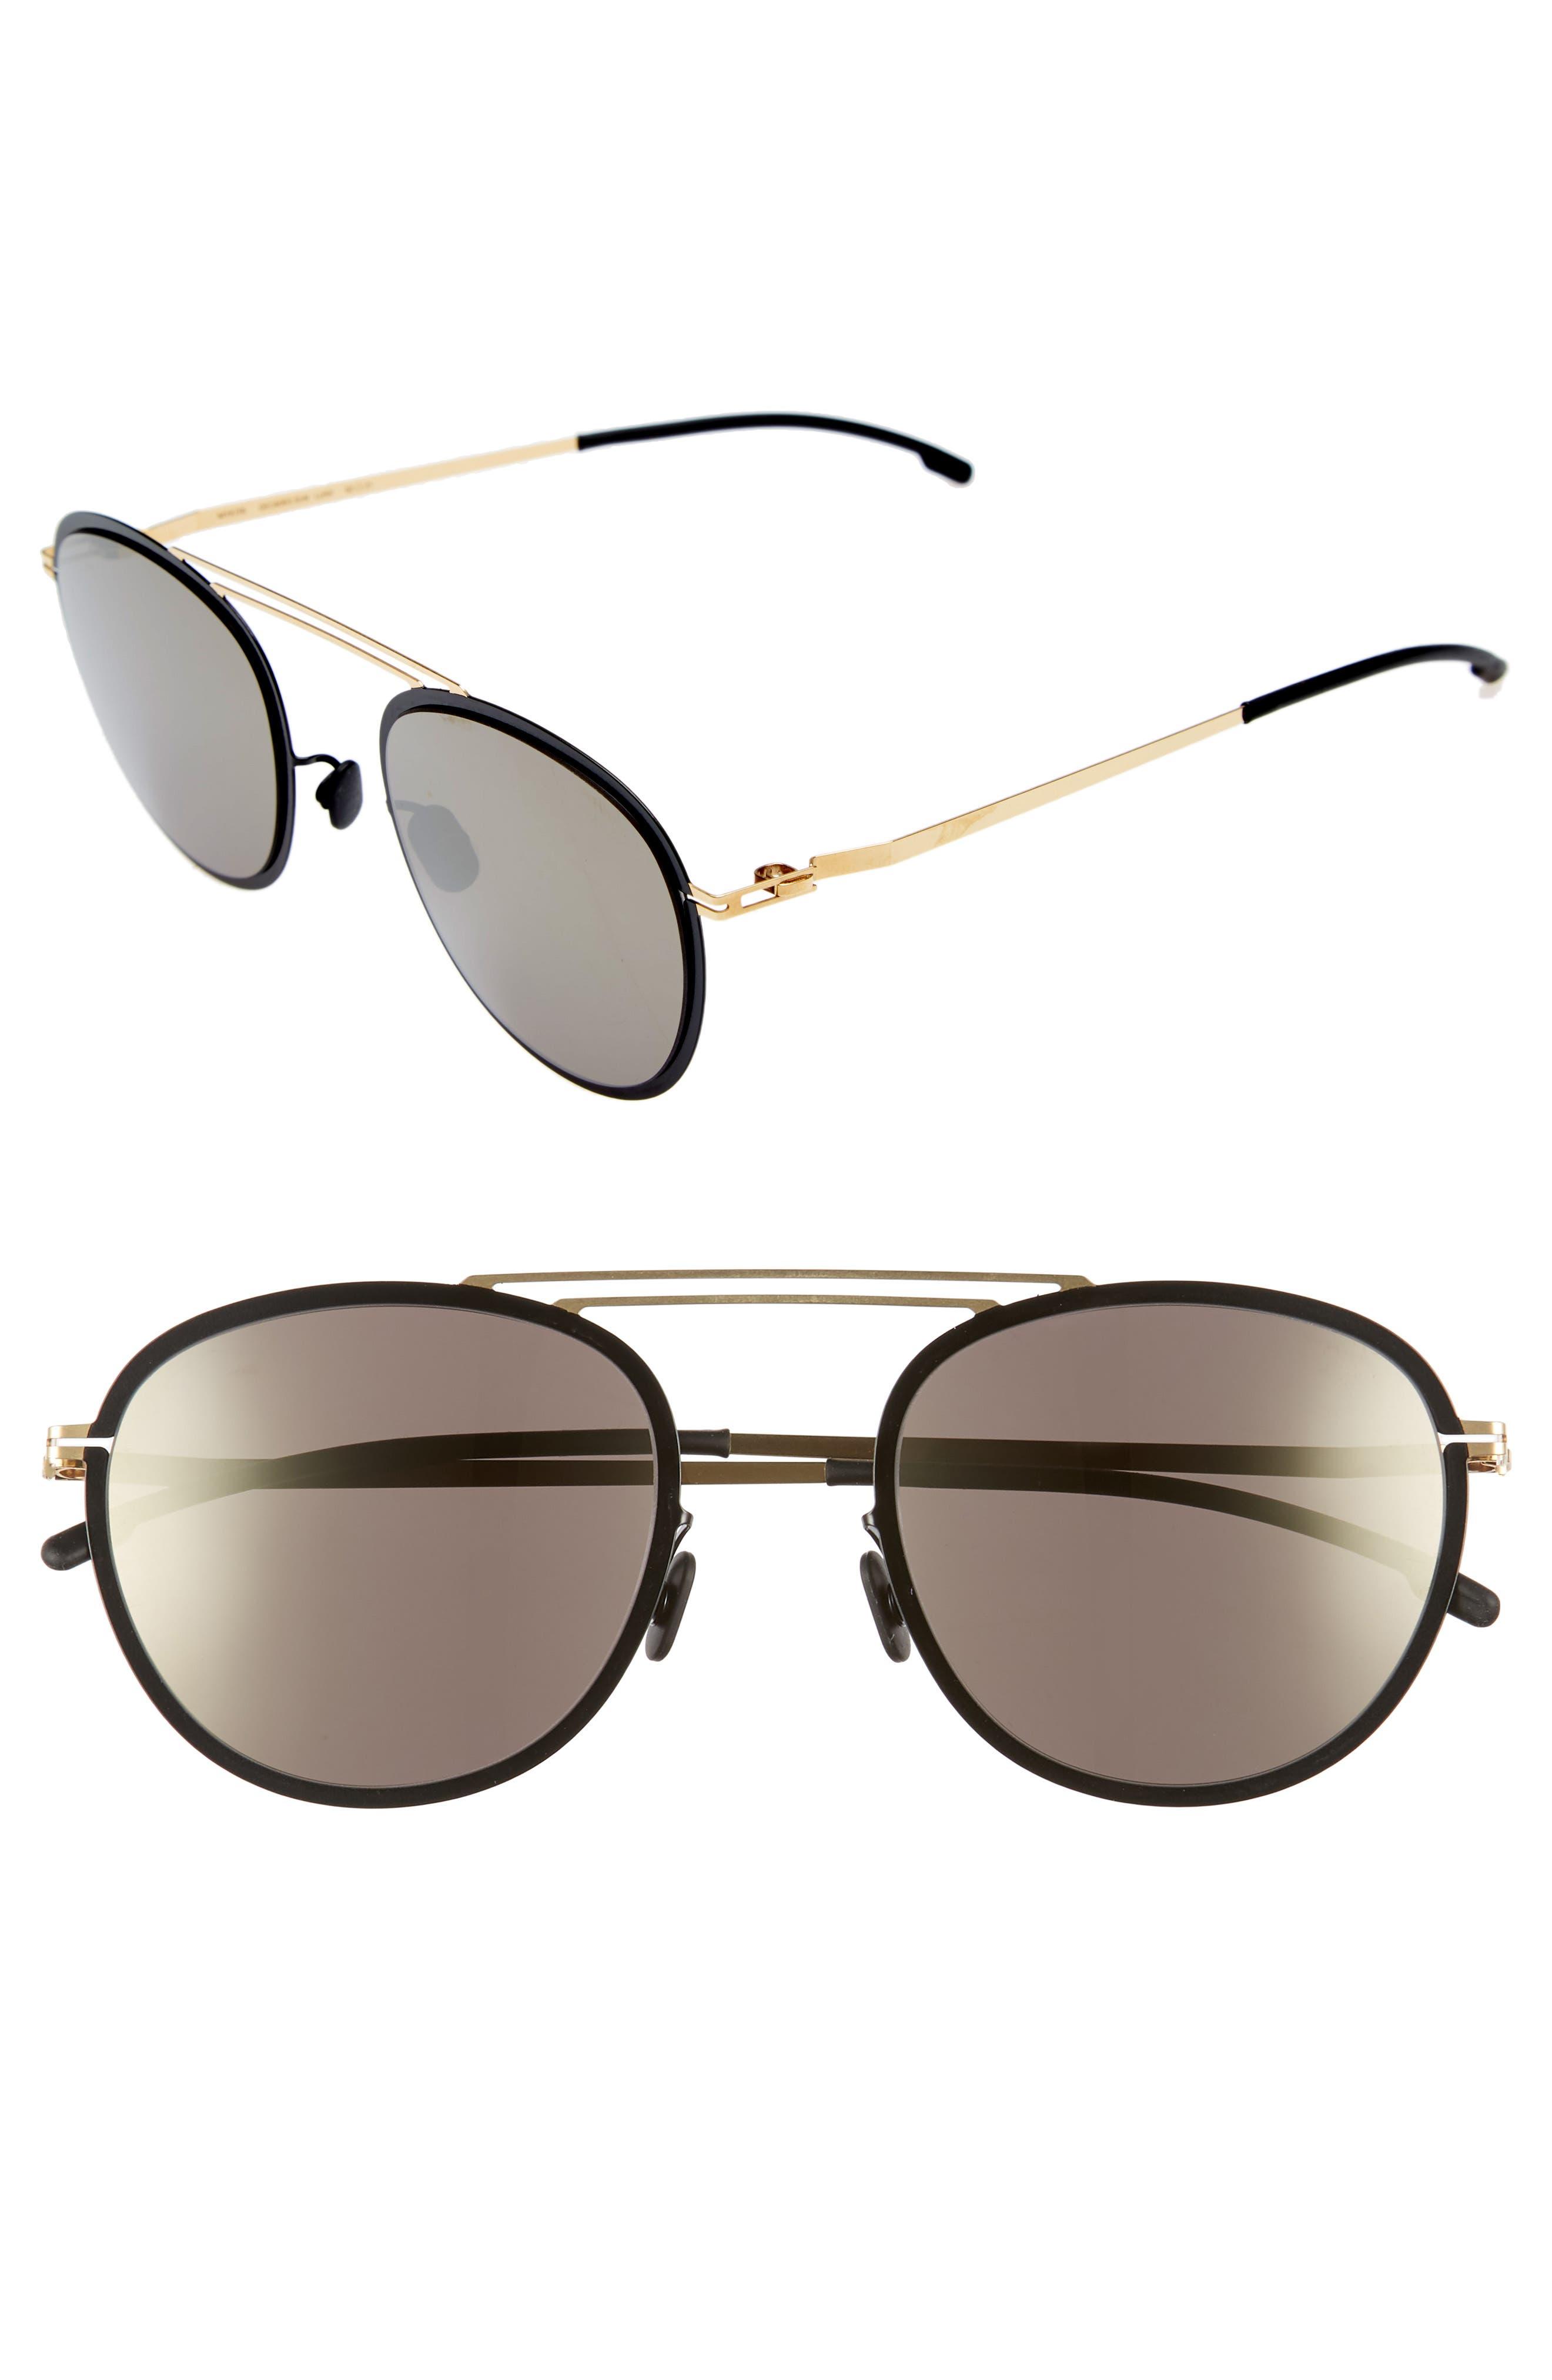 Luigi 52mm Aviator Sunglasses,                         Main,                         color, 710